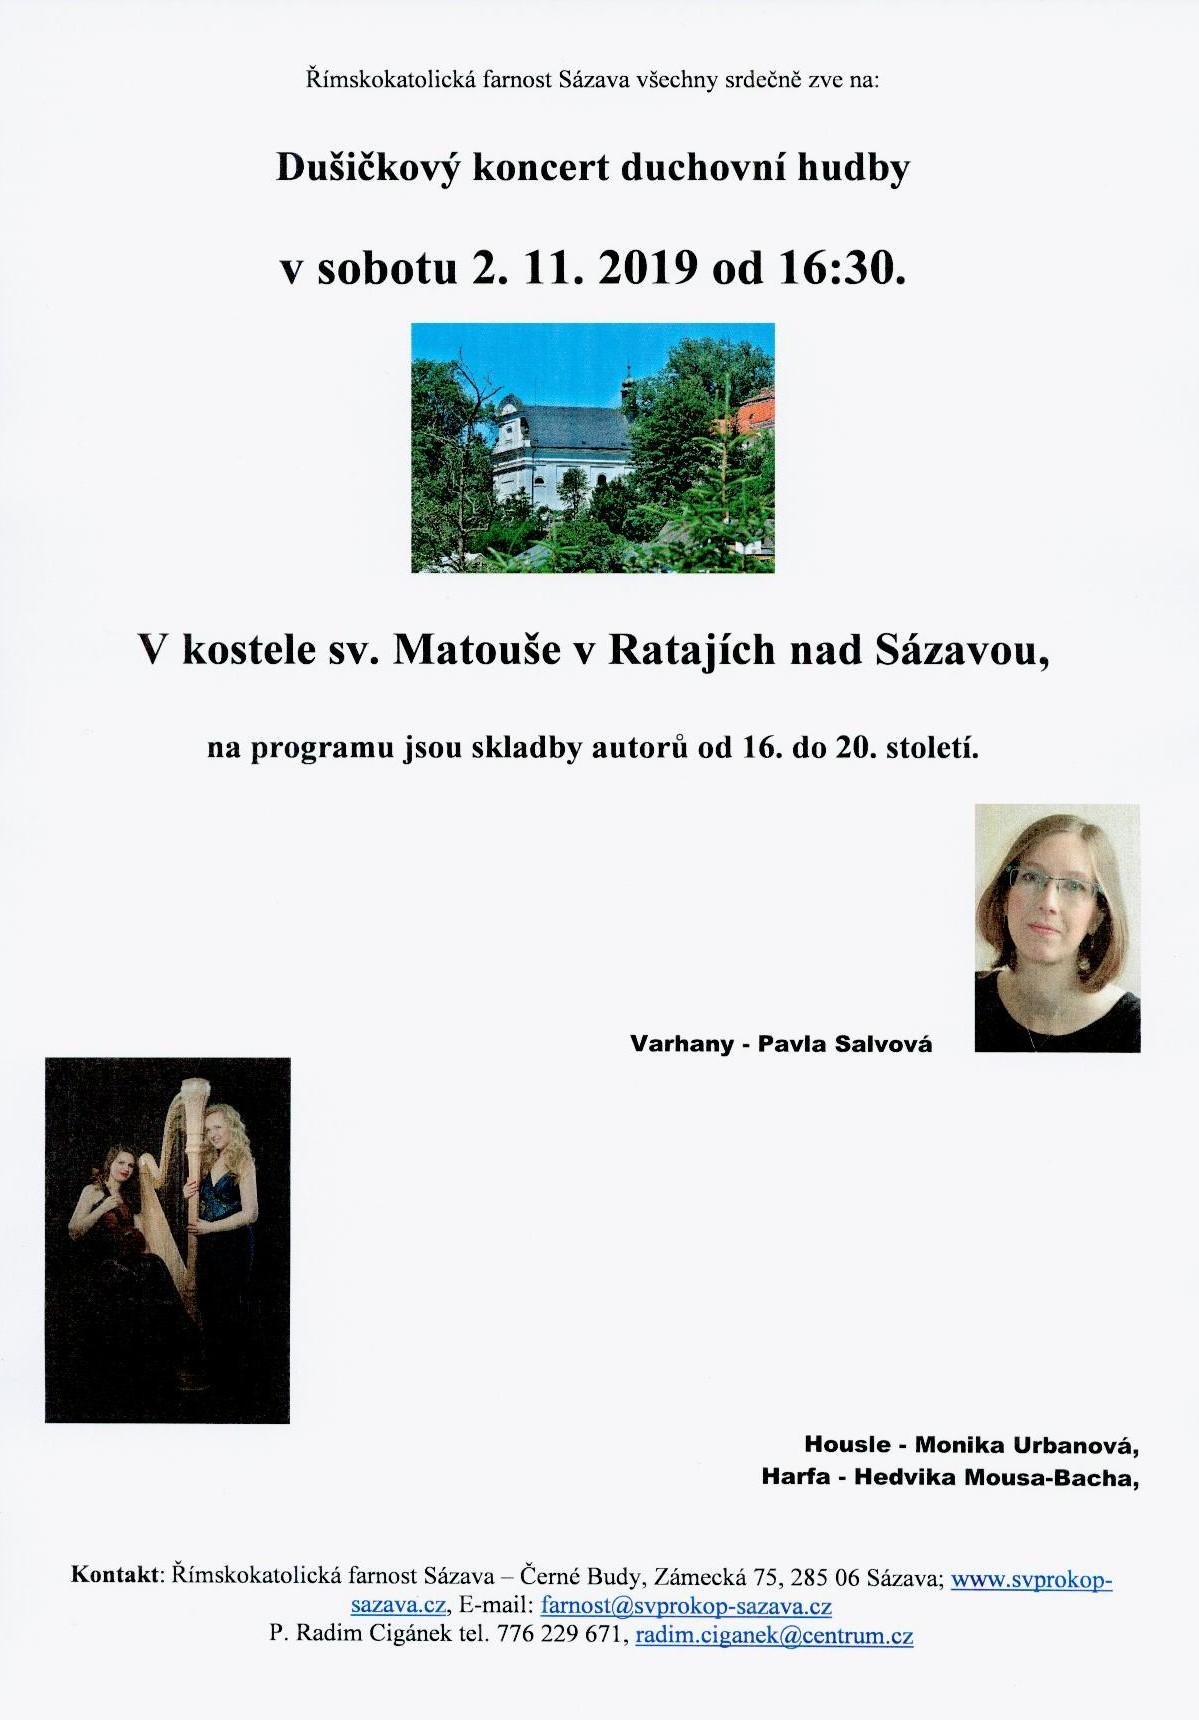 Dusickovy koncert 2019 Salvova Urbanova Mousa Bacha